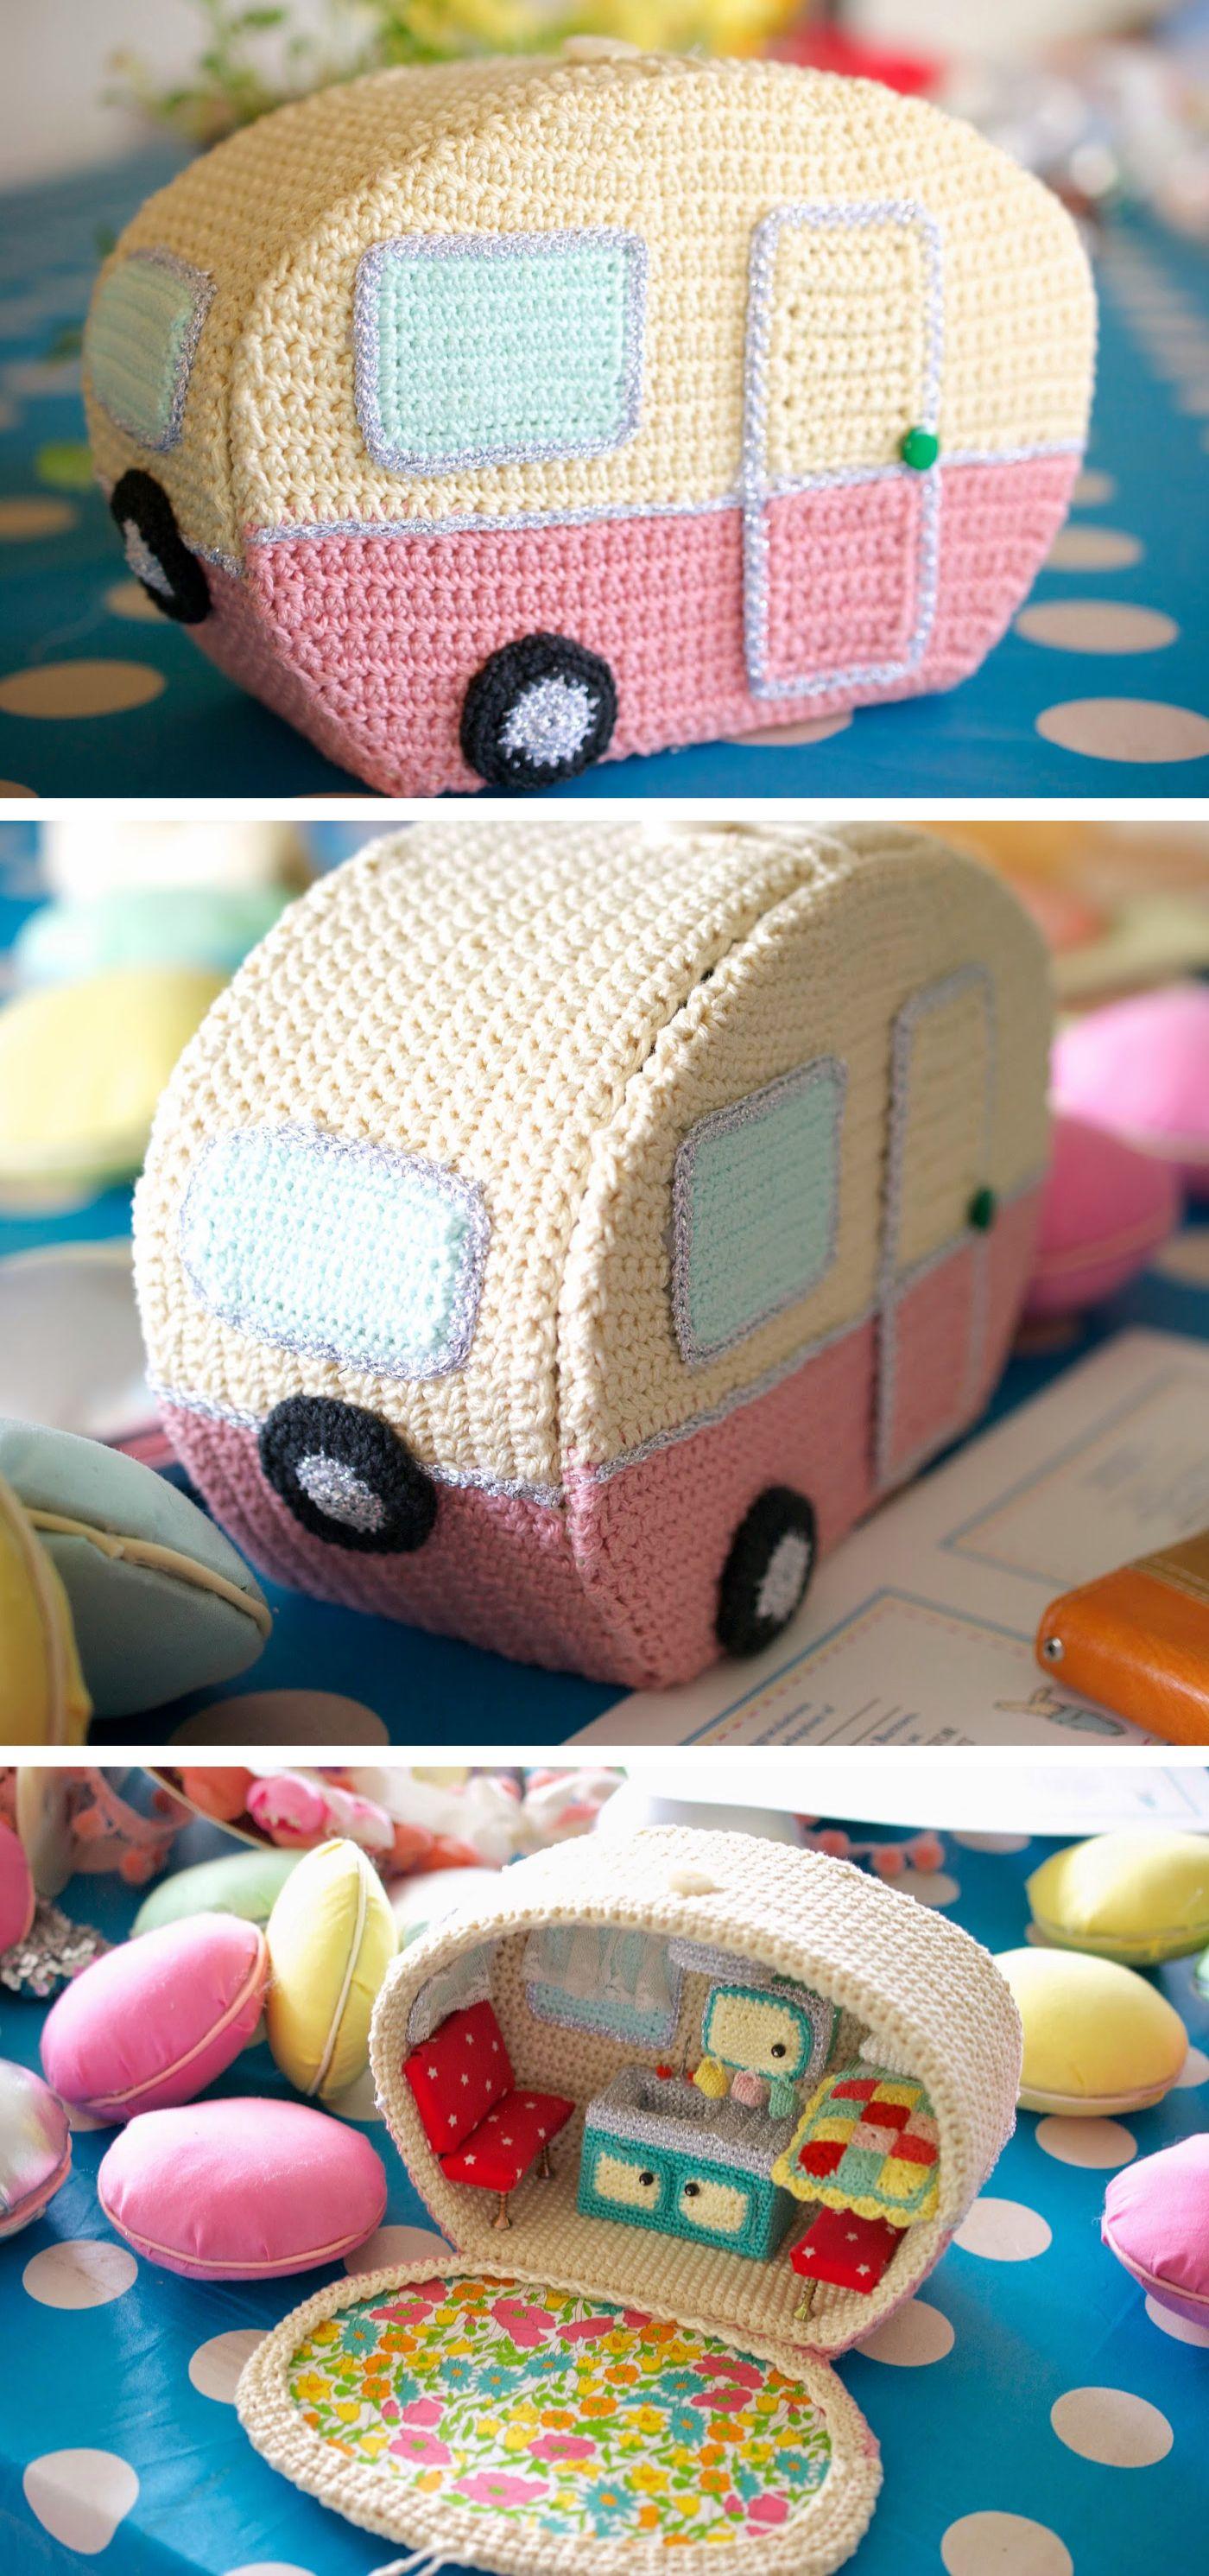 crochet camper amigurumi pattern | stuff brante pins | Pinterest ...